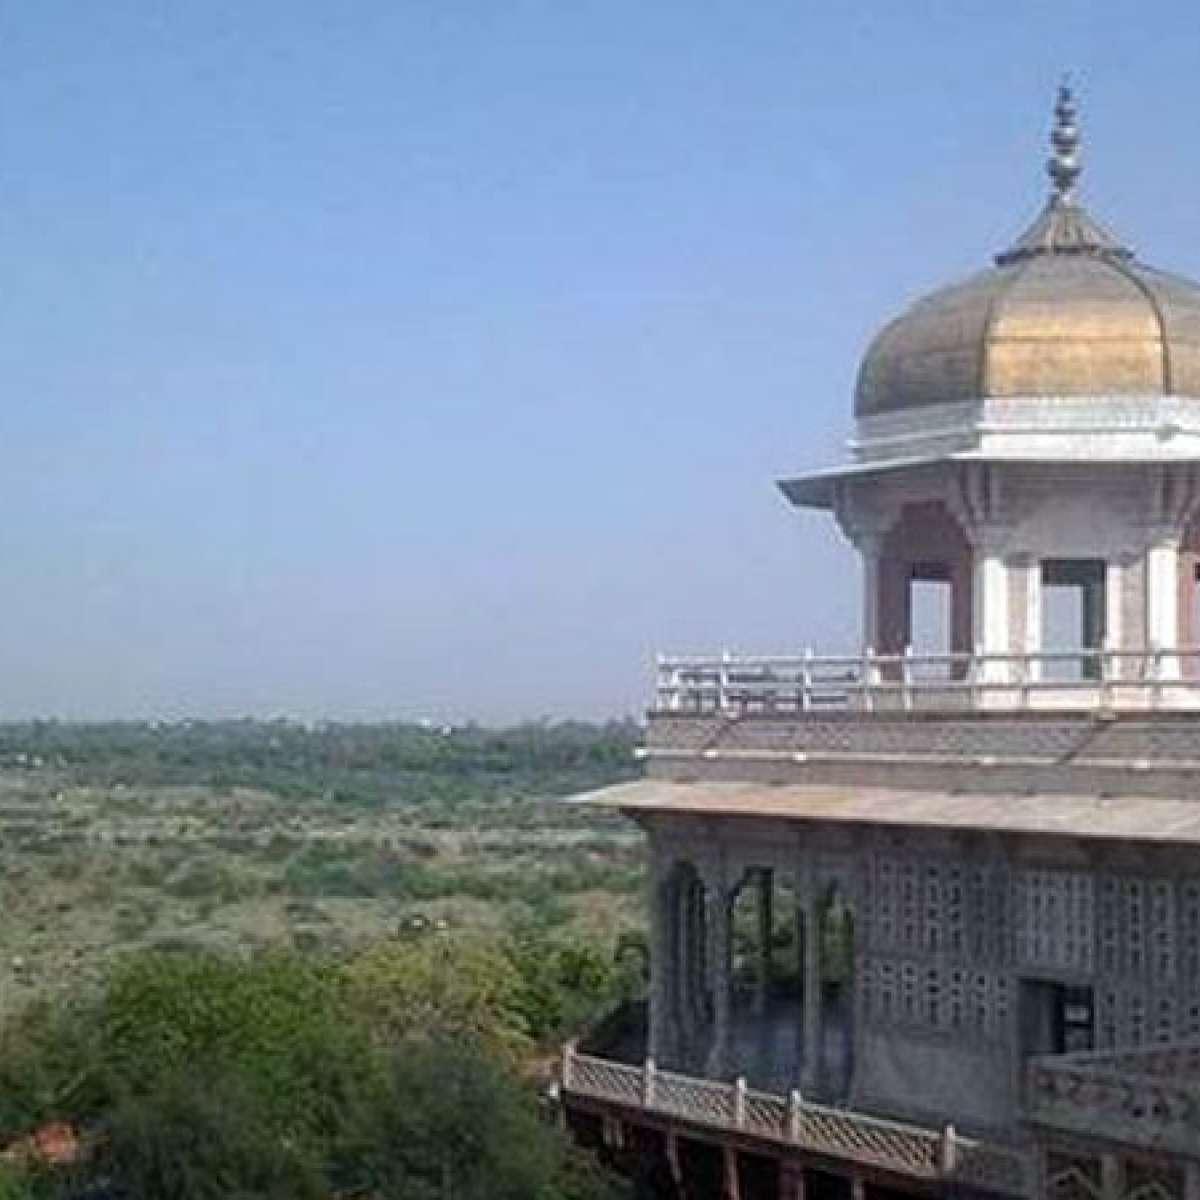 Krishna Land in Uttar Pradesh: All we know about UP theme park so far